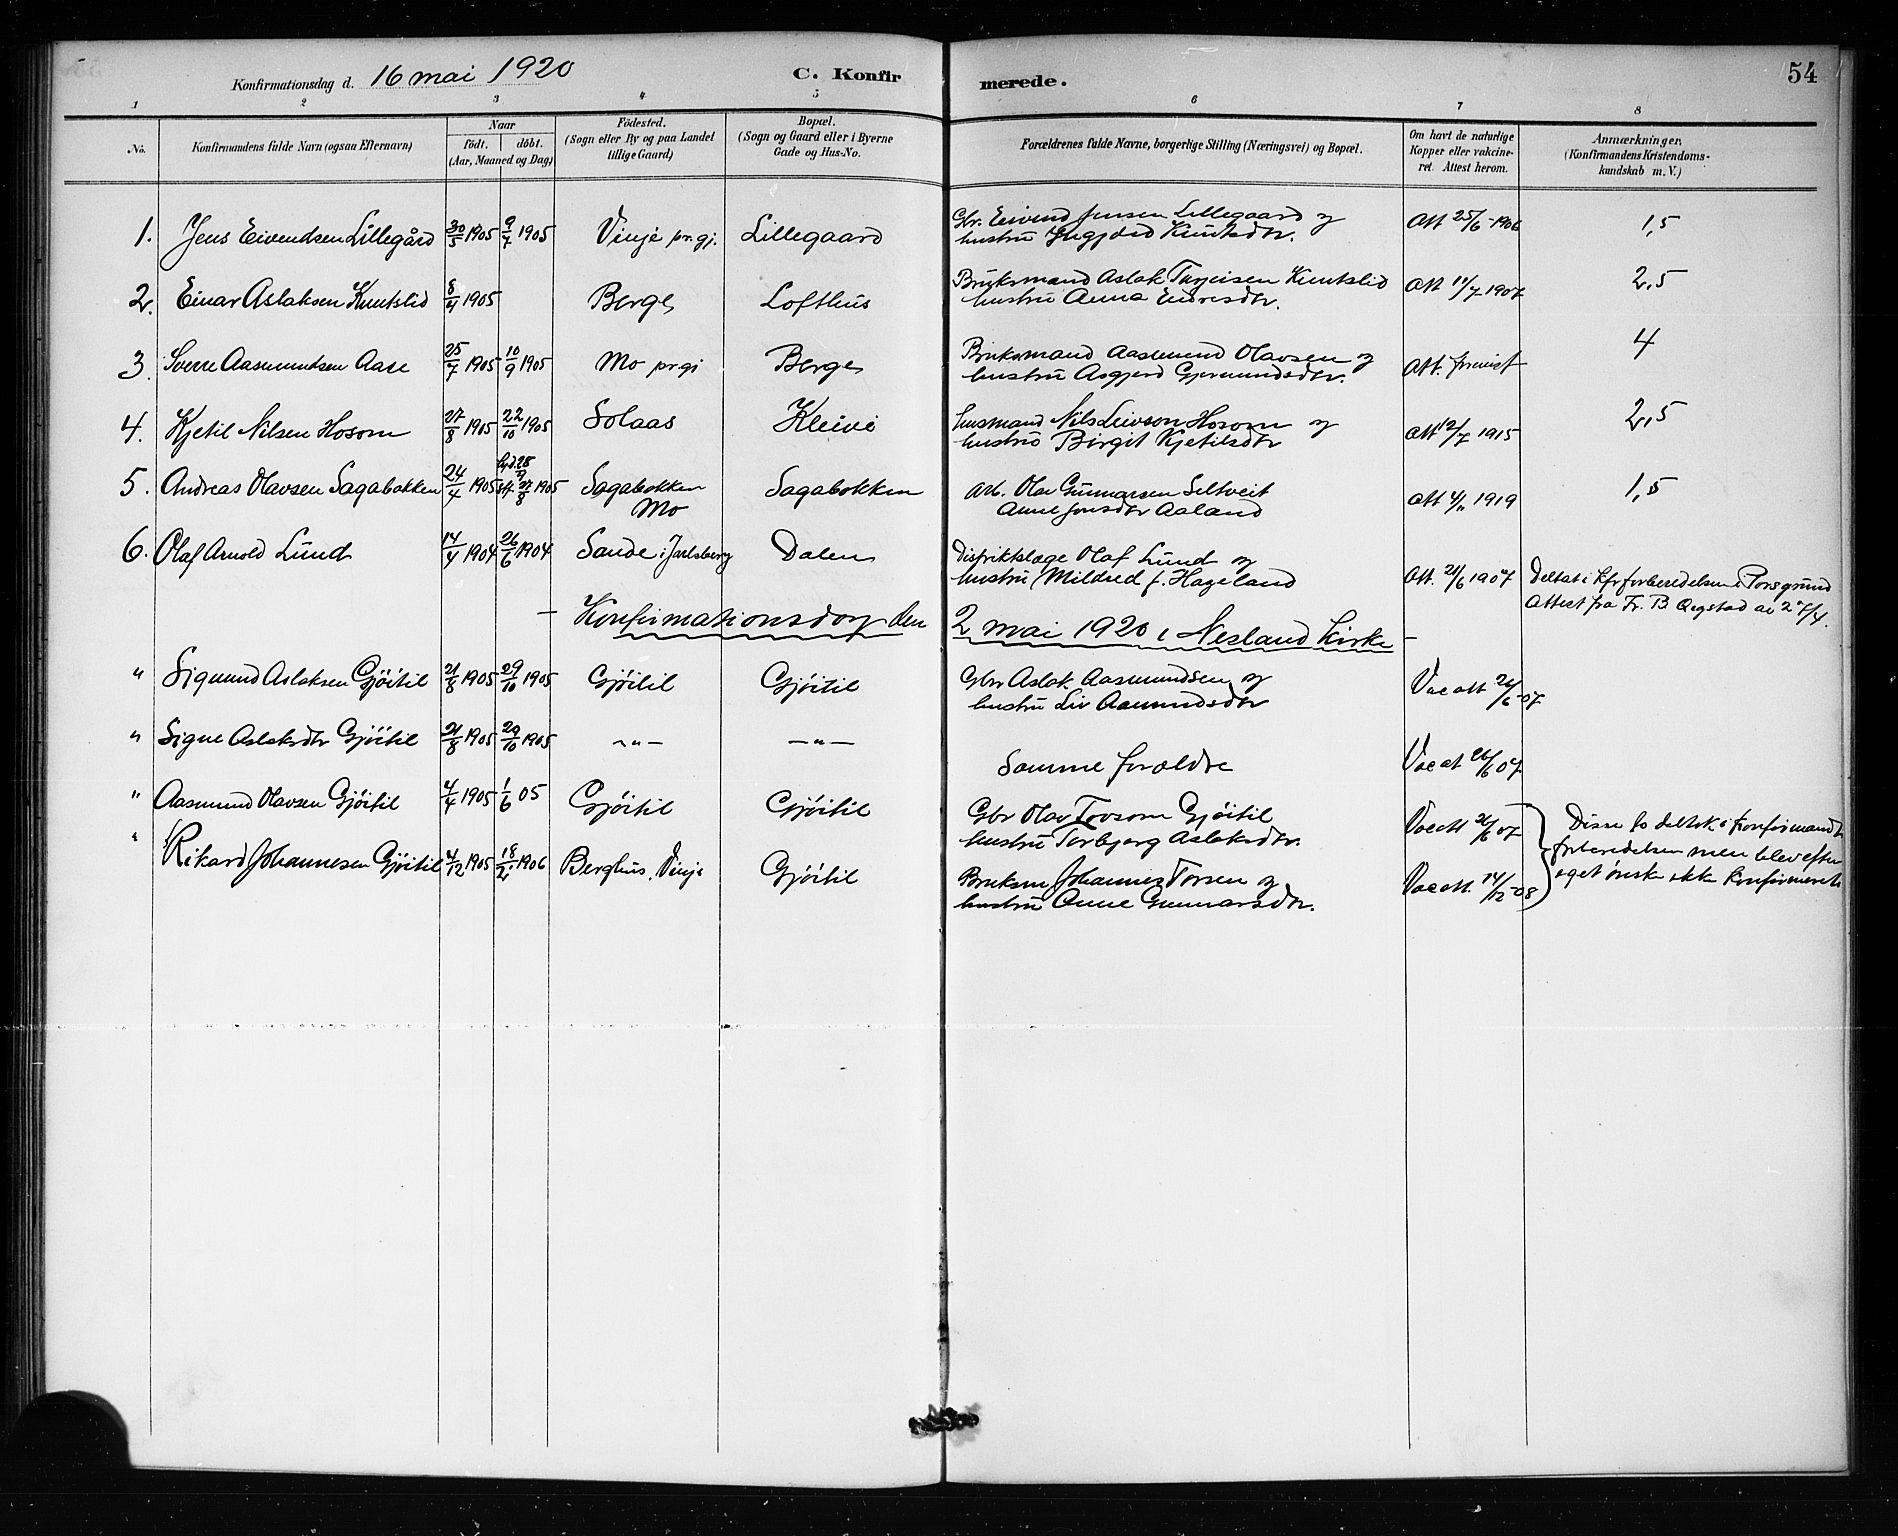 SAKO, Lårdal kirkebøker, G/Gb/L0003: Klokkerbok nr. II 3, 1889-1920, s. 54